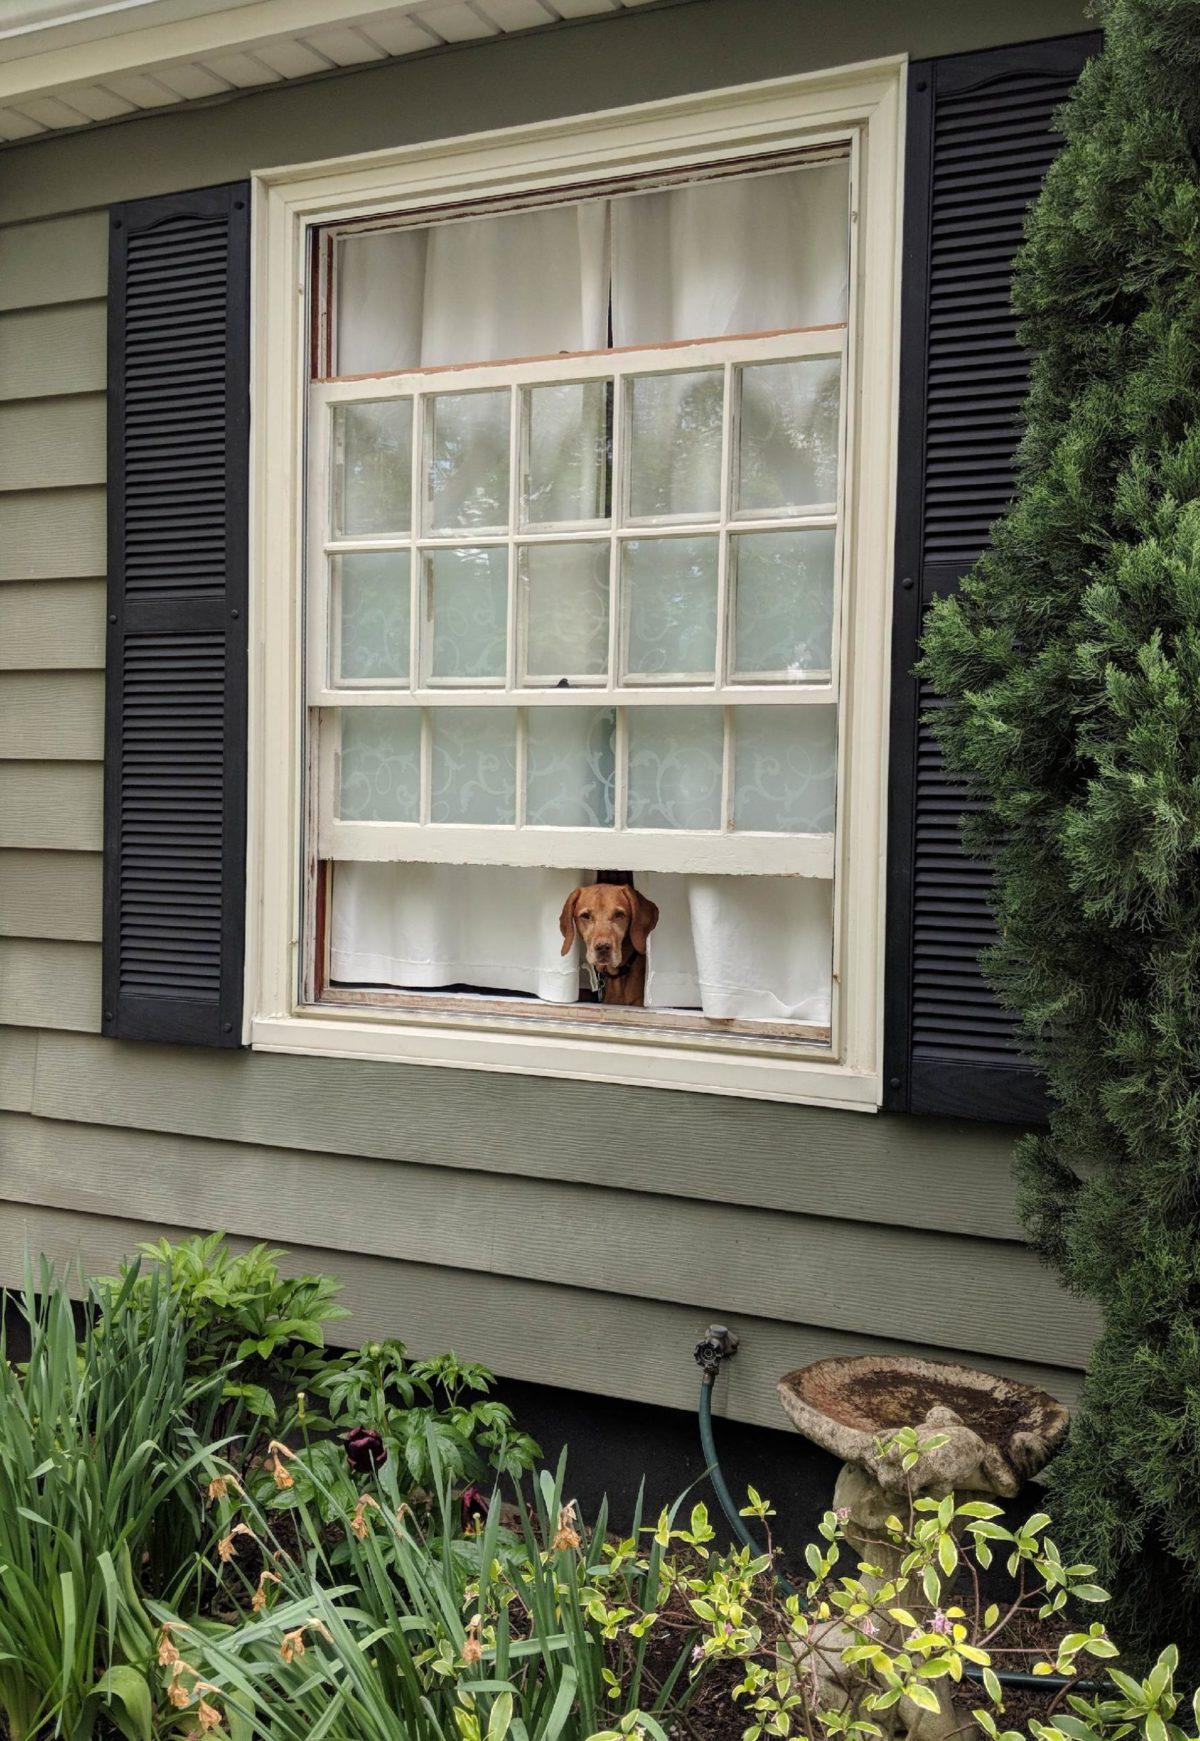 Everyone enjoys a little fresh air.